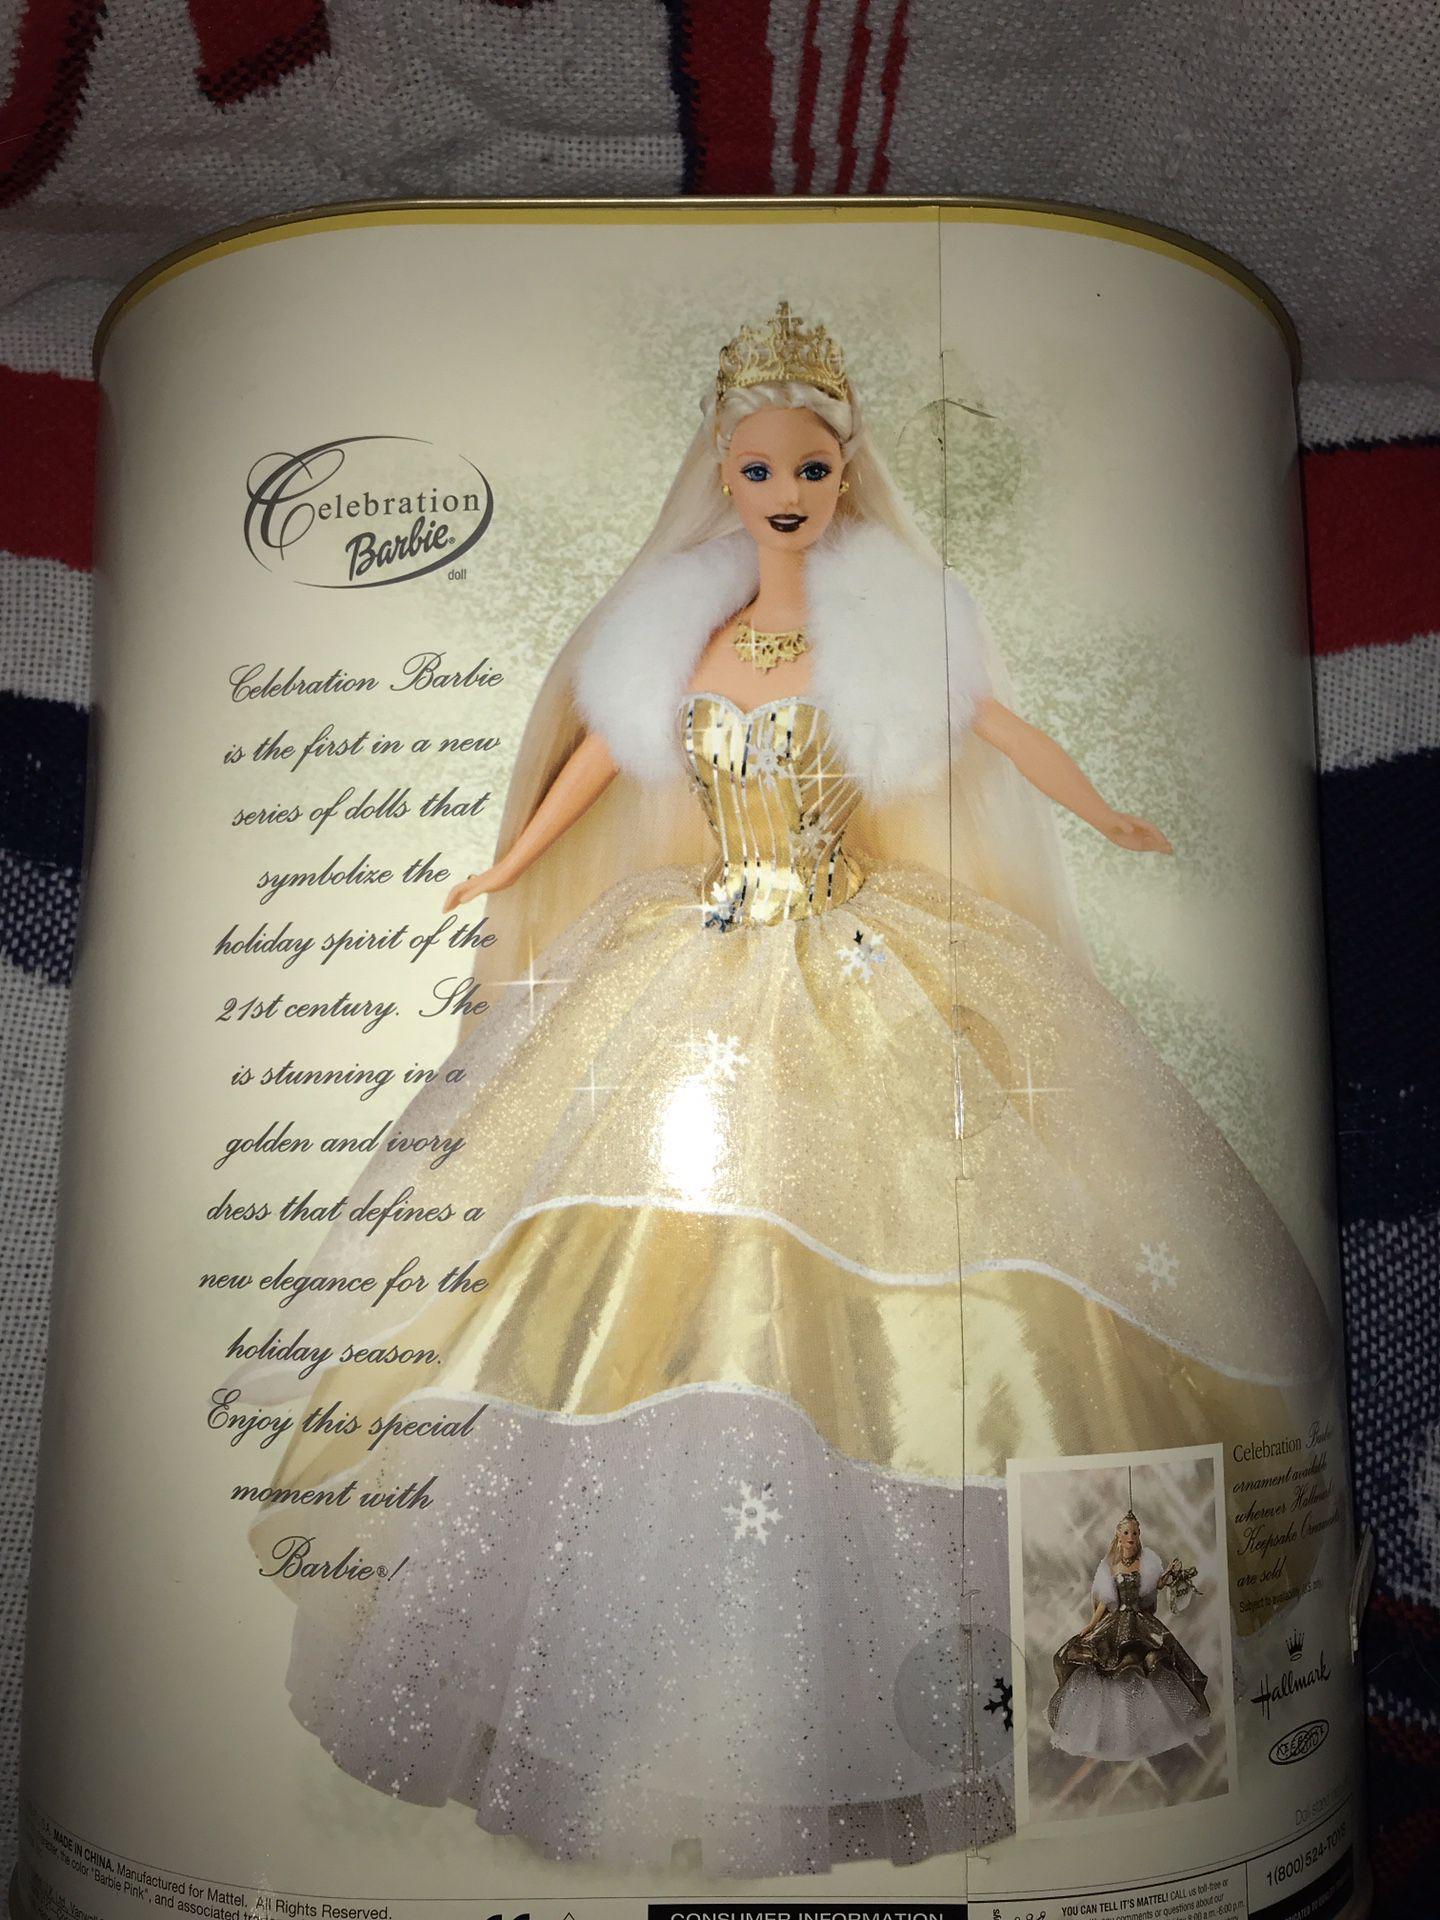 Special 2000 Celebration Barbie Doll